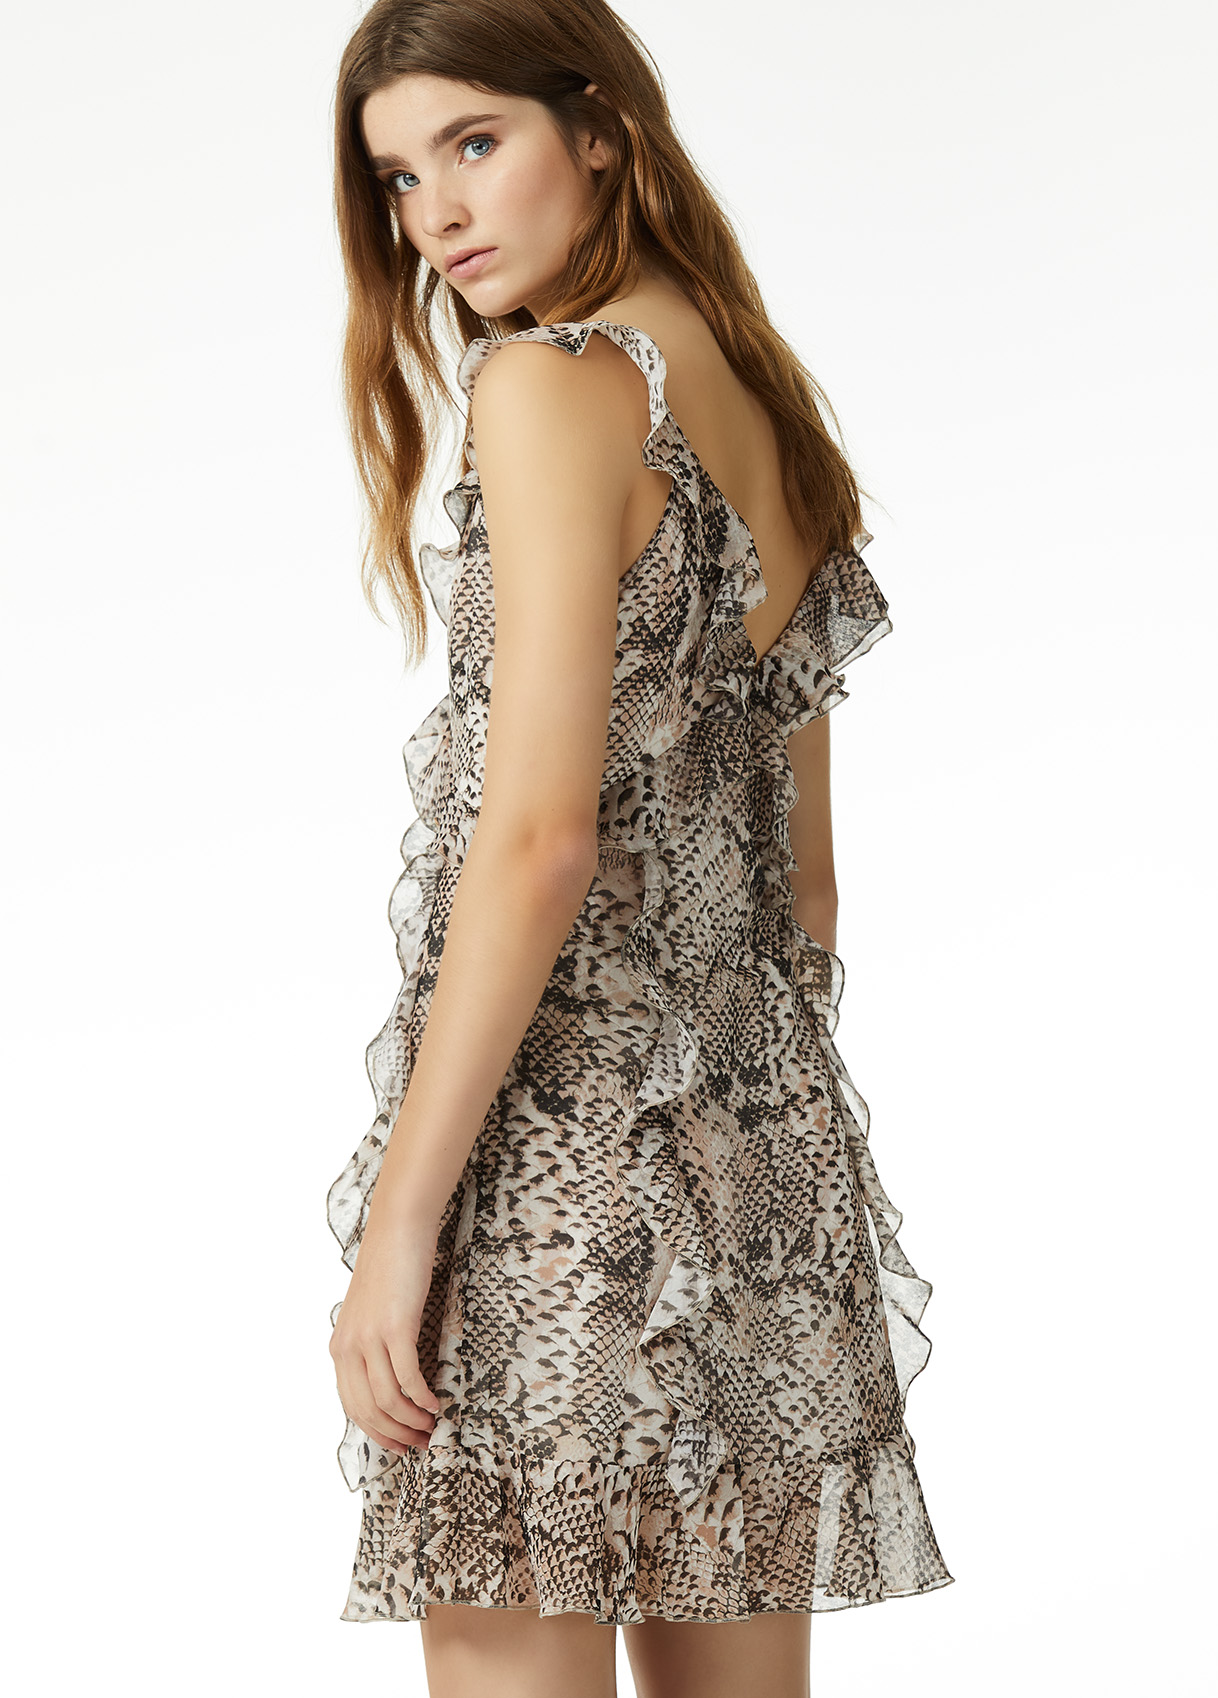 Liu JO 8059599688849-Dresses-Shortdresses-I19058T2191V9876-I-AR-N-N-02-N_1